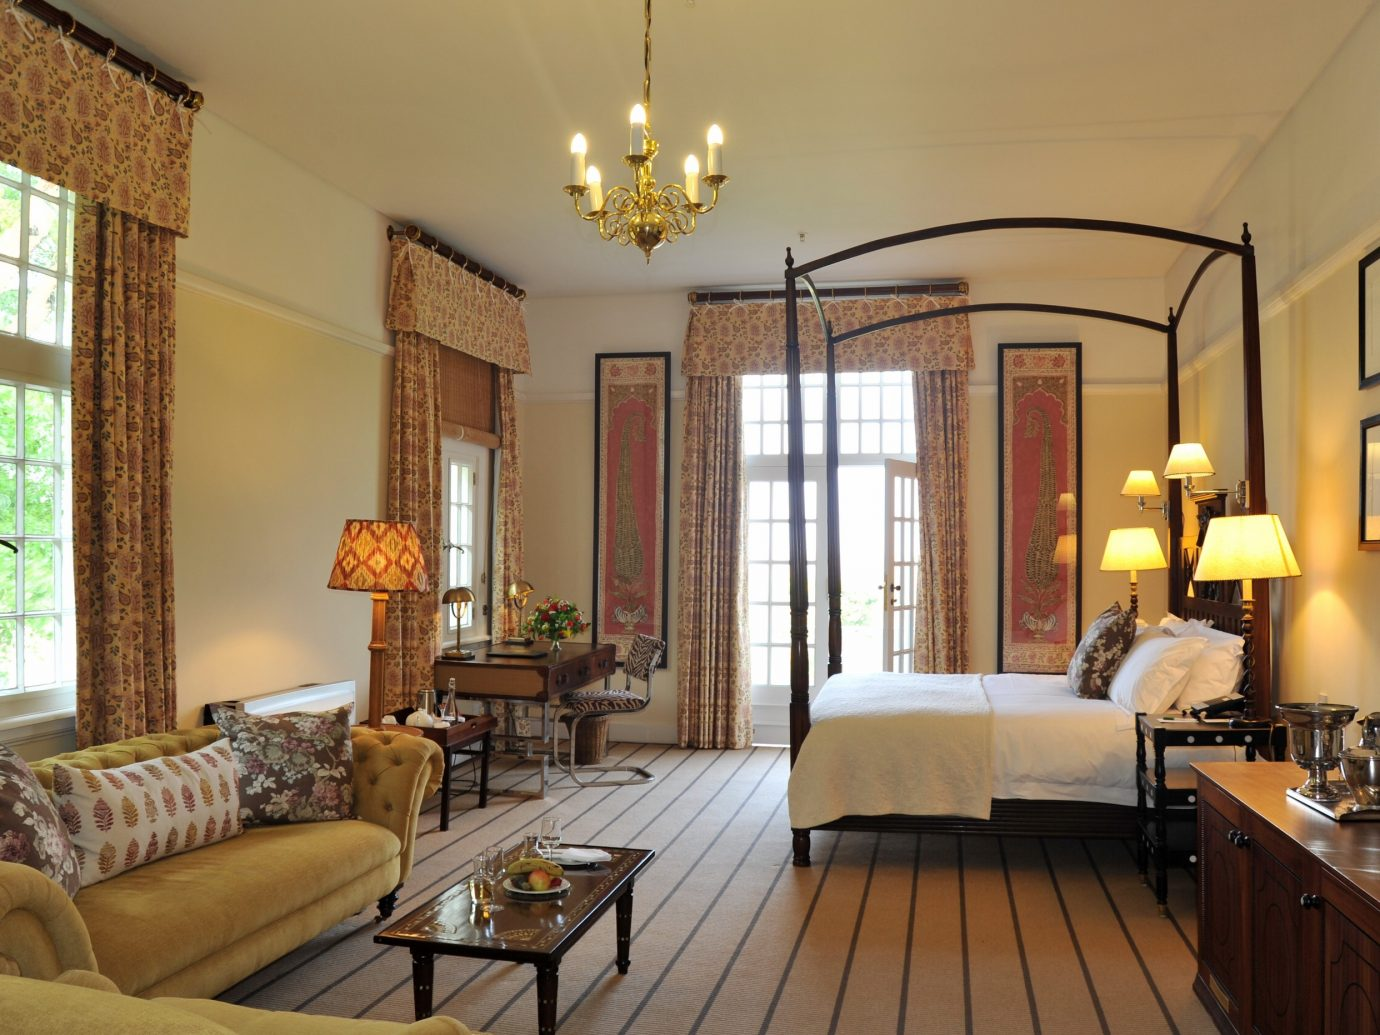 Bedroom at Victoria Falls Hotel, Zimbabwe